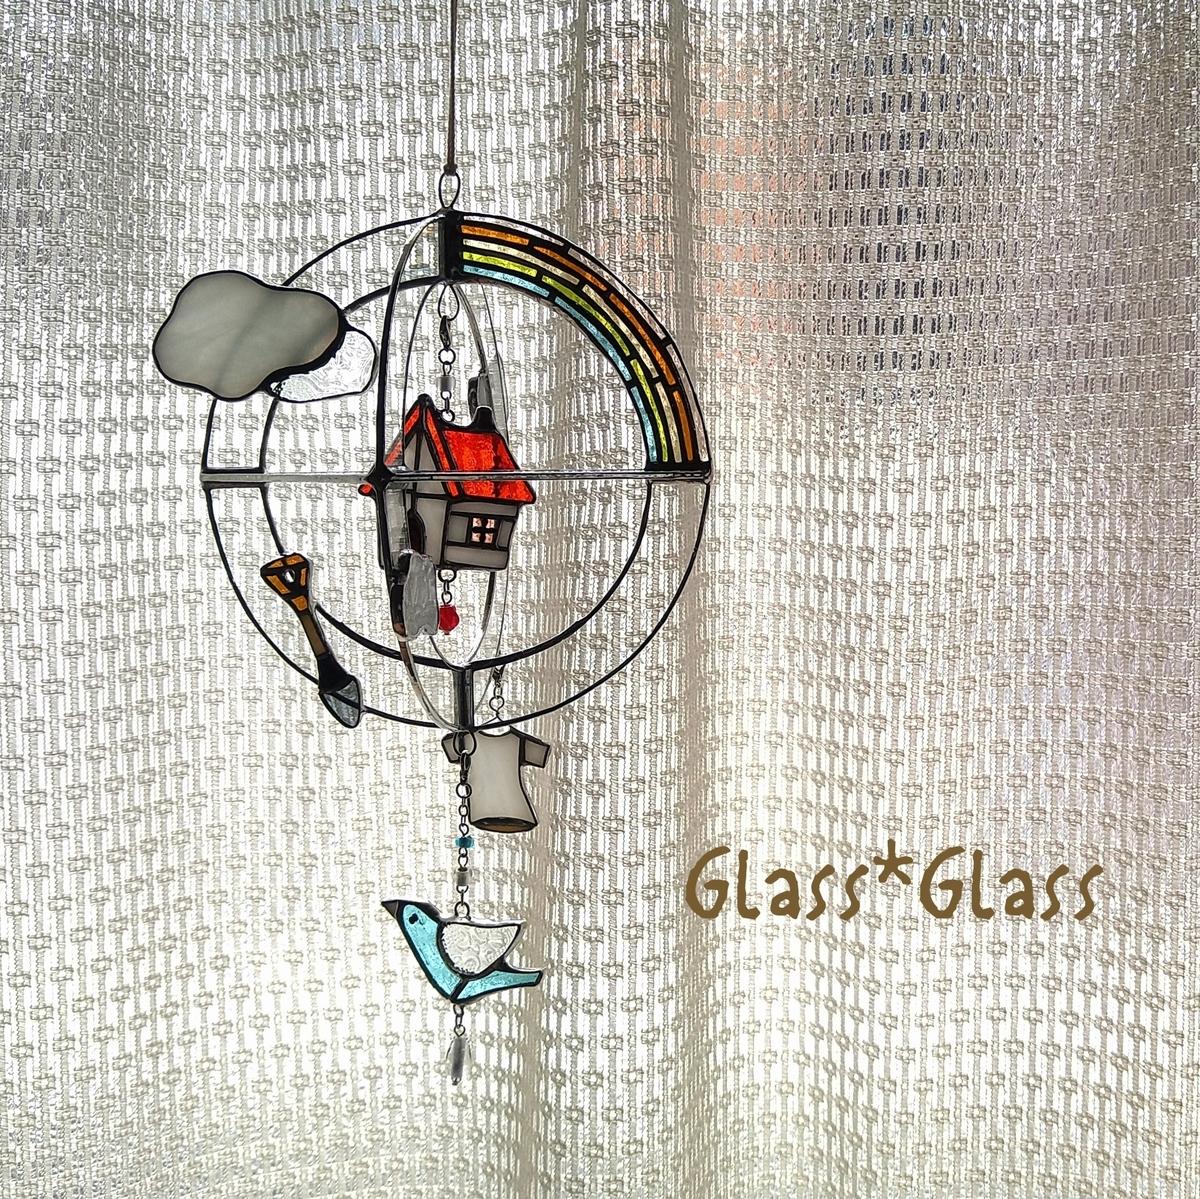 f:id:glassglassmegu:20210520144346j:plain